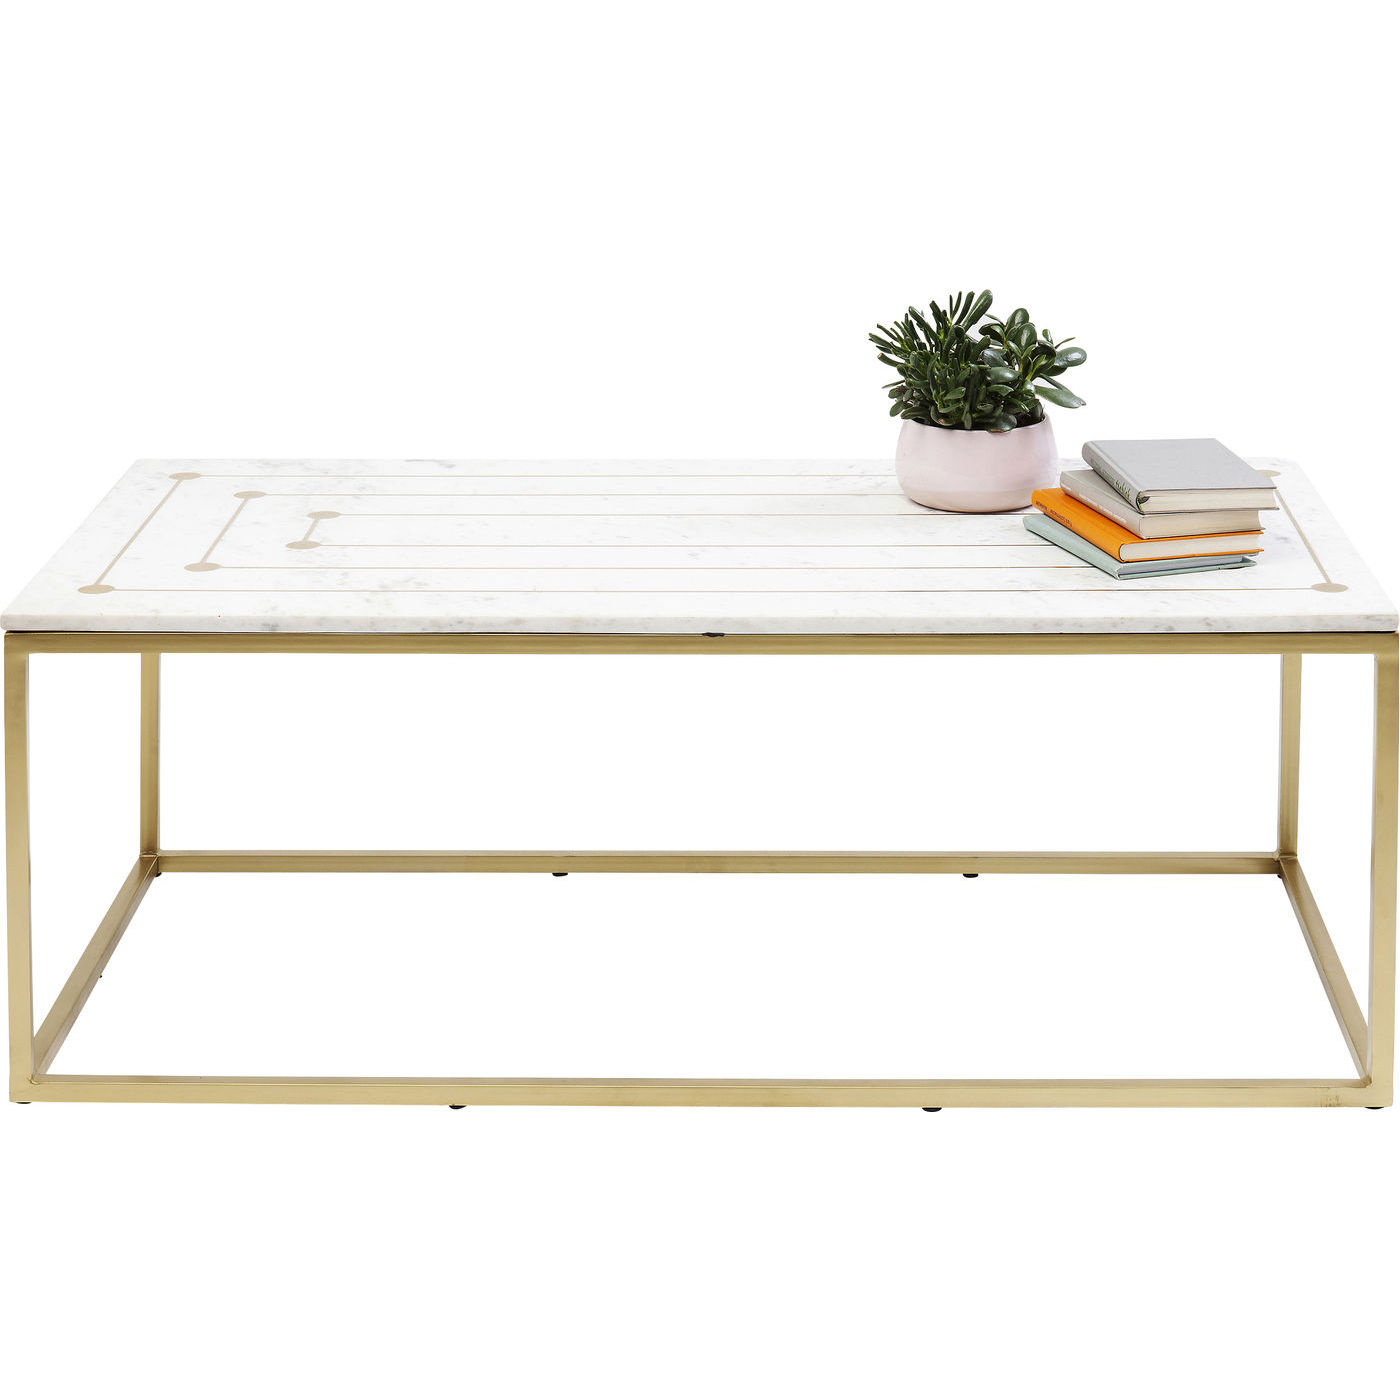 kare design – Kare design mystic rectangular sofabord - hvid marmor/messing stål, unik (120x60) på boboonline.dk